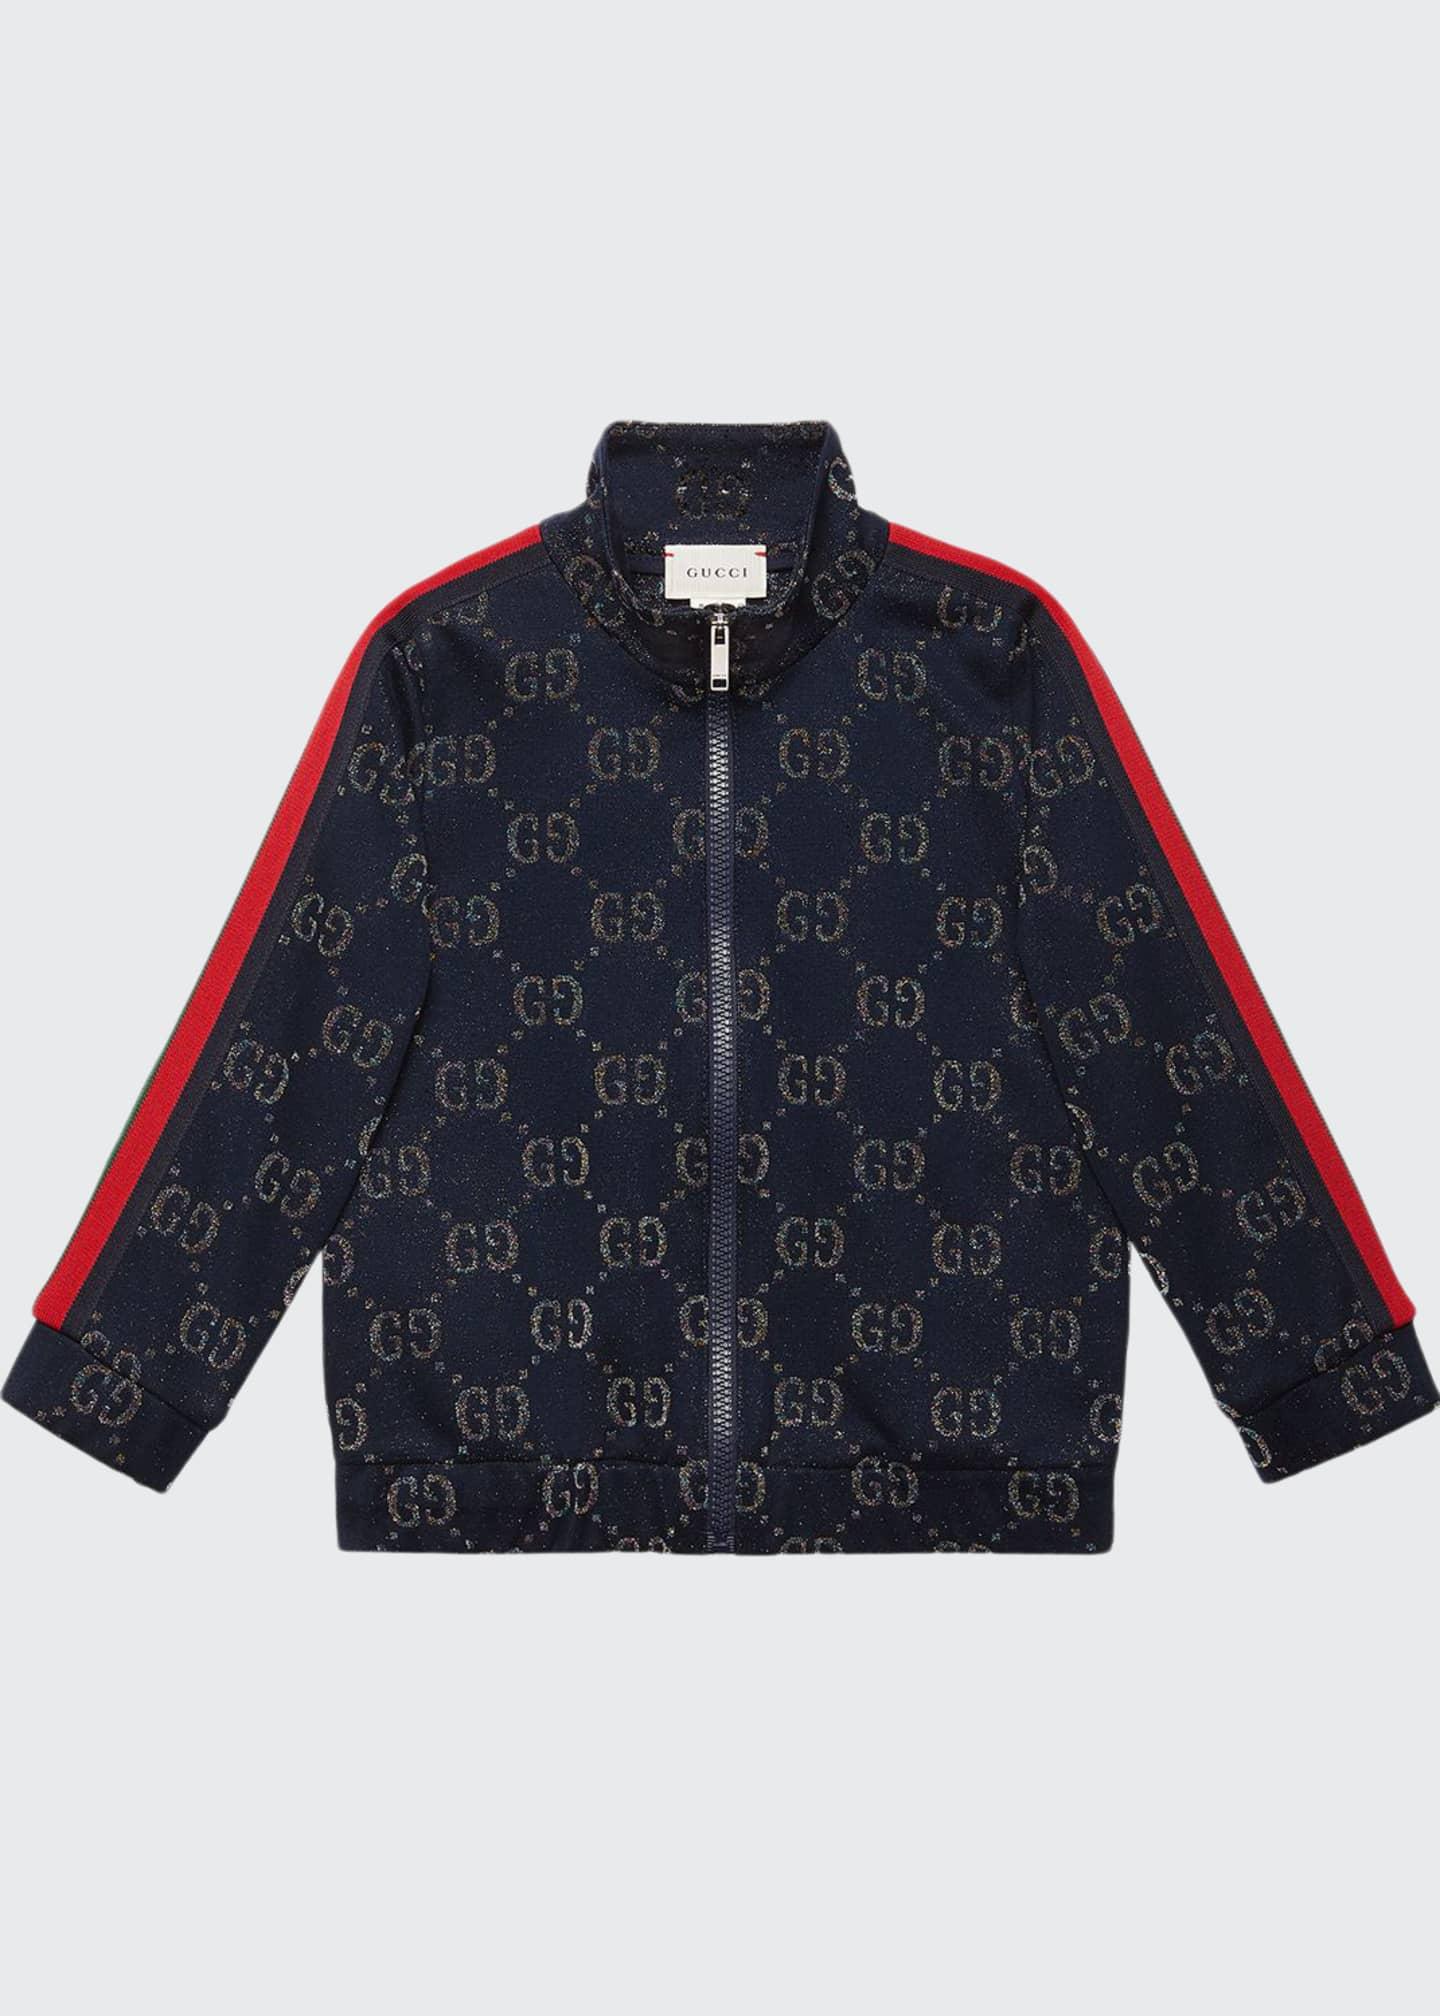 Gucci Metallic GG Jacquard Jacket w/ Web Trim